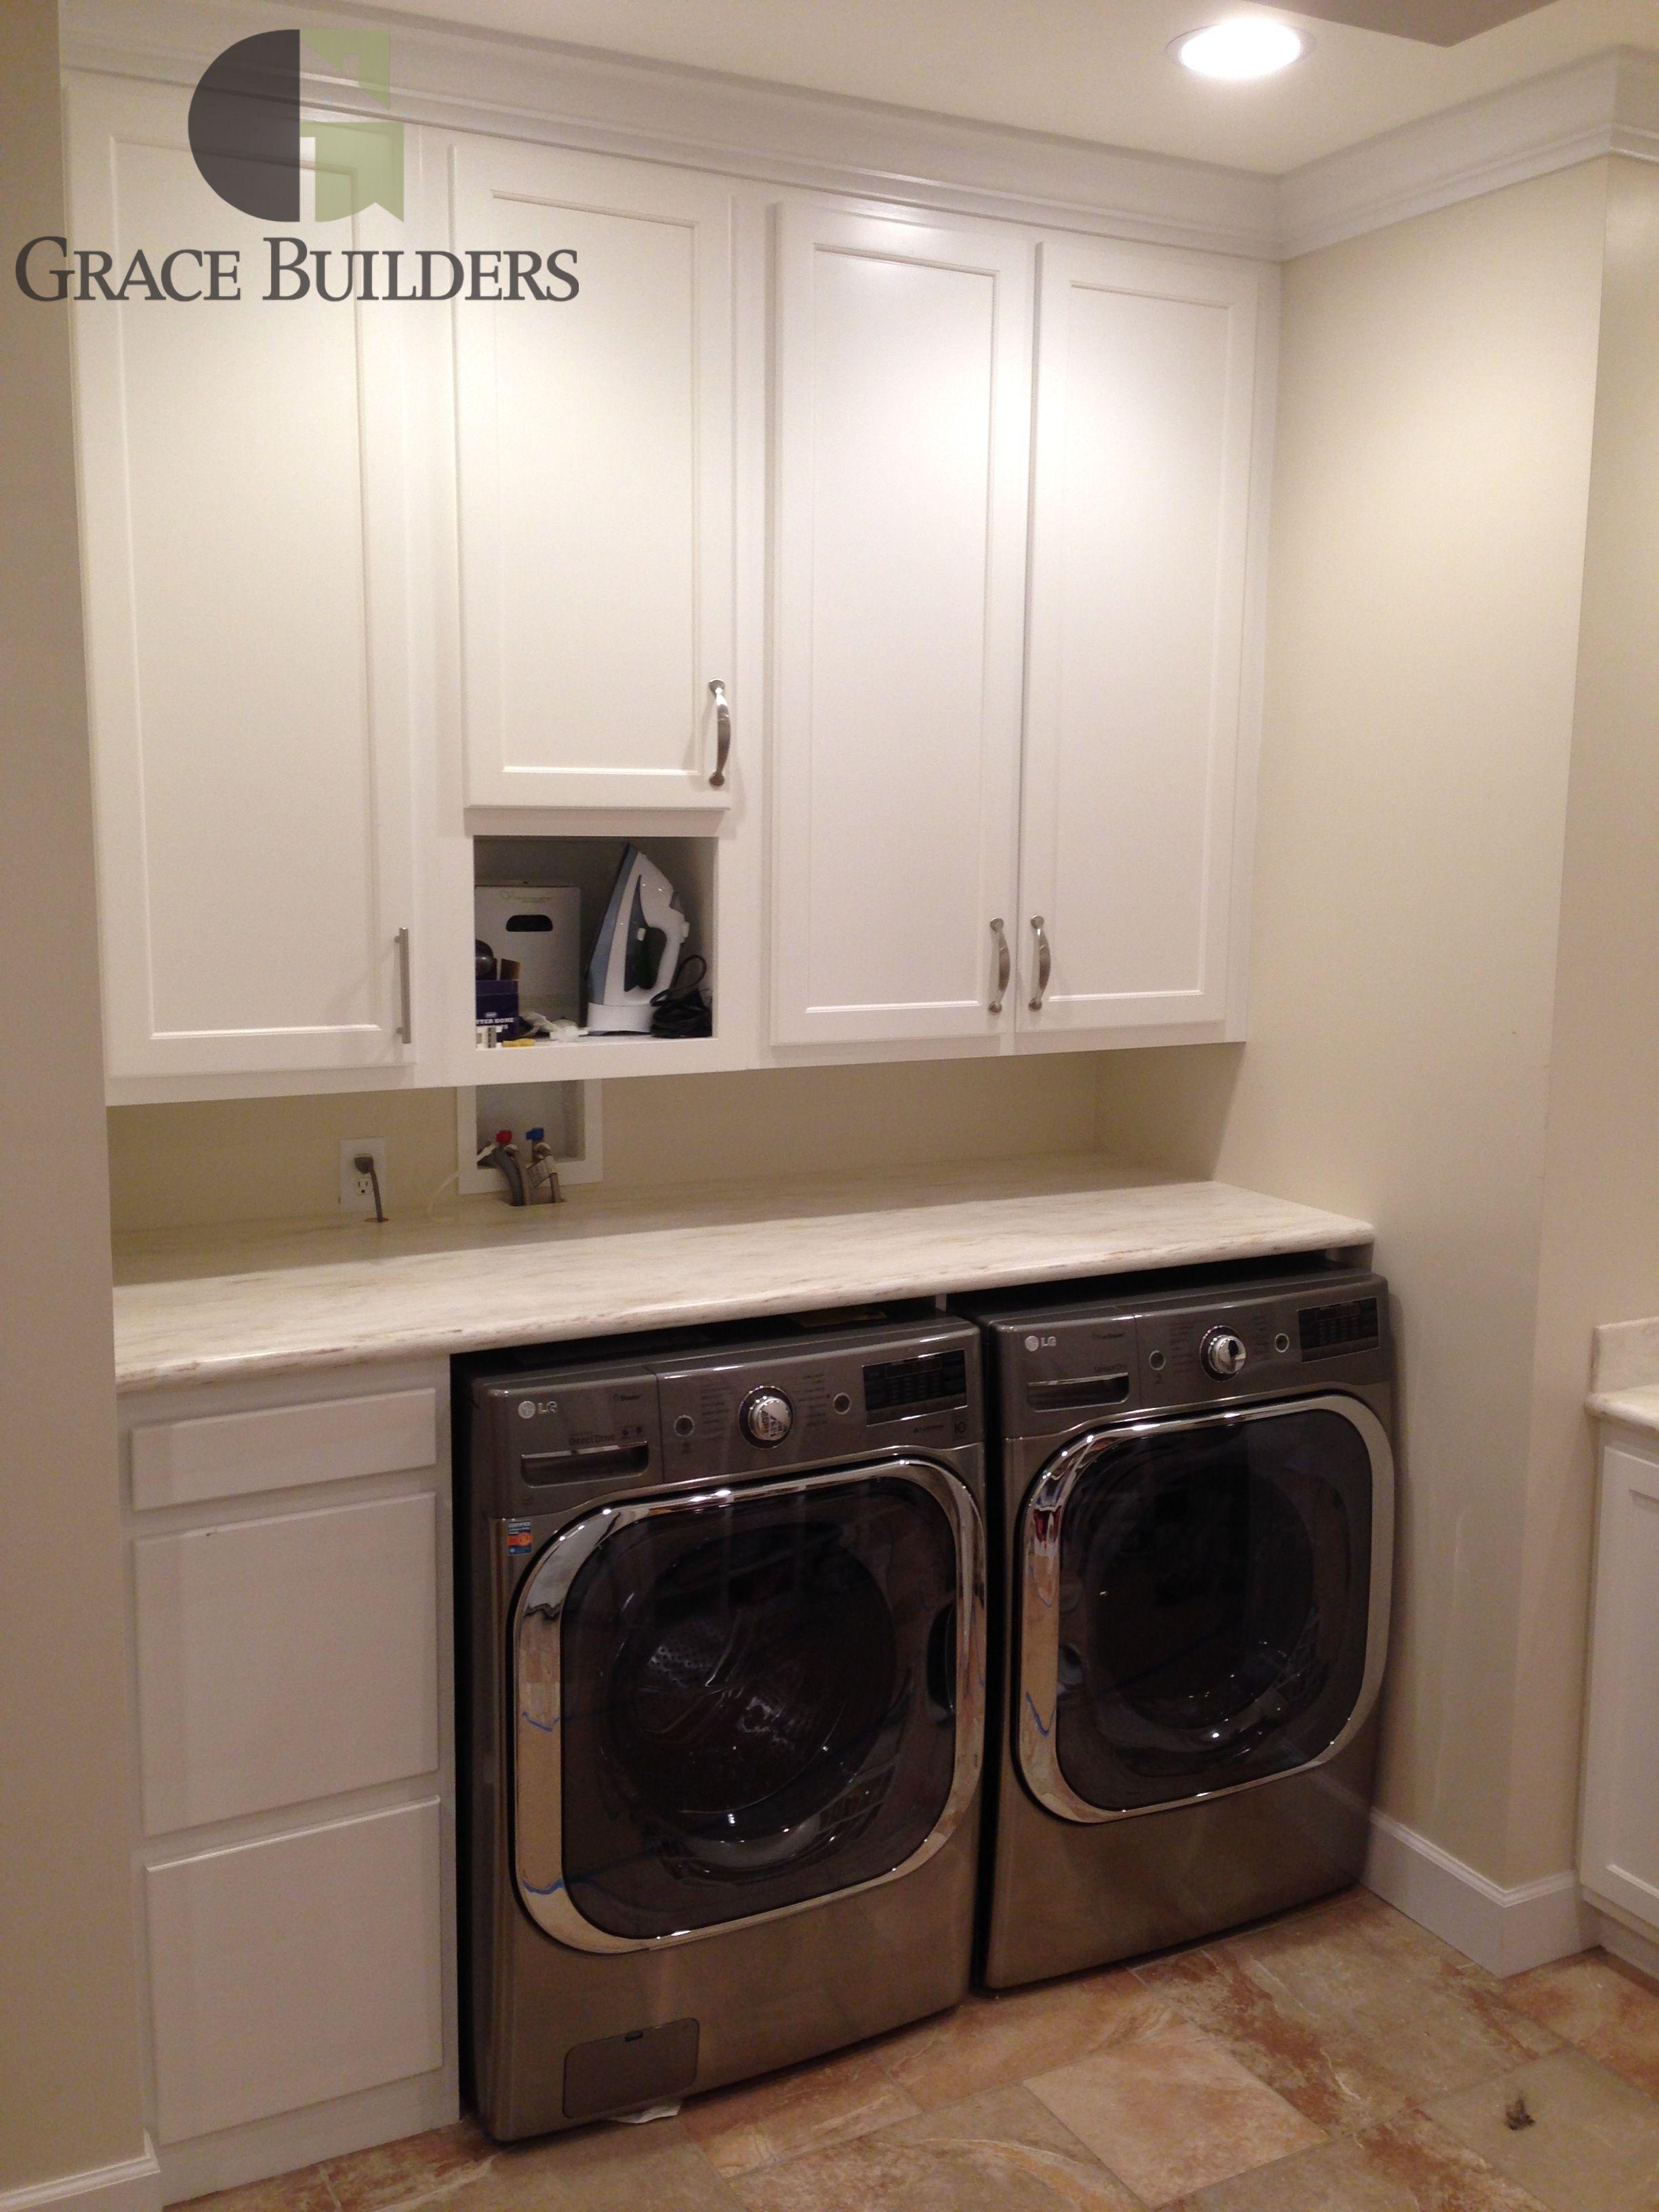 Grace builders laundry room appliances washing machine